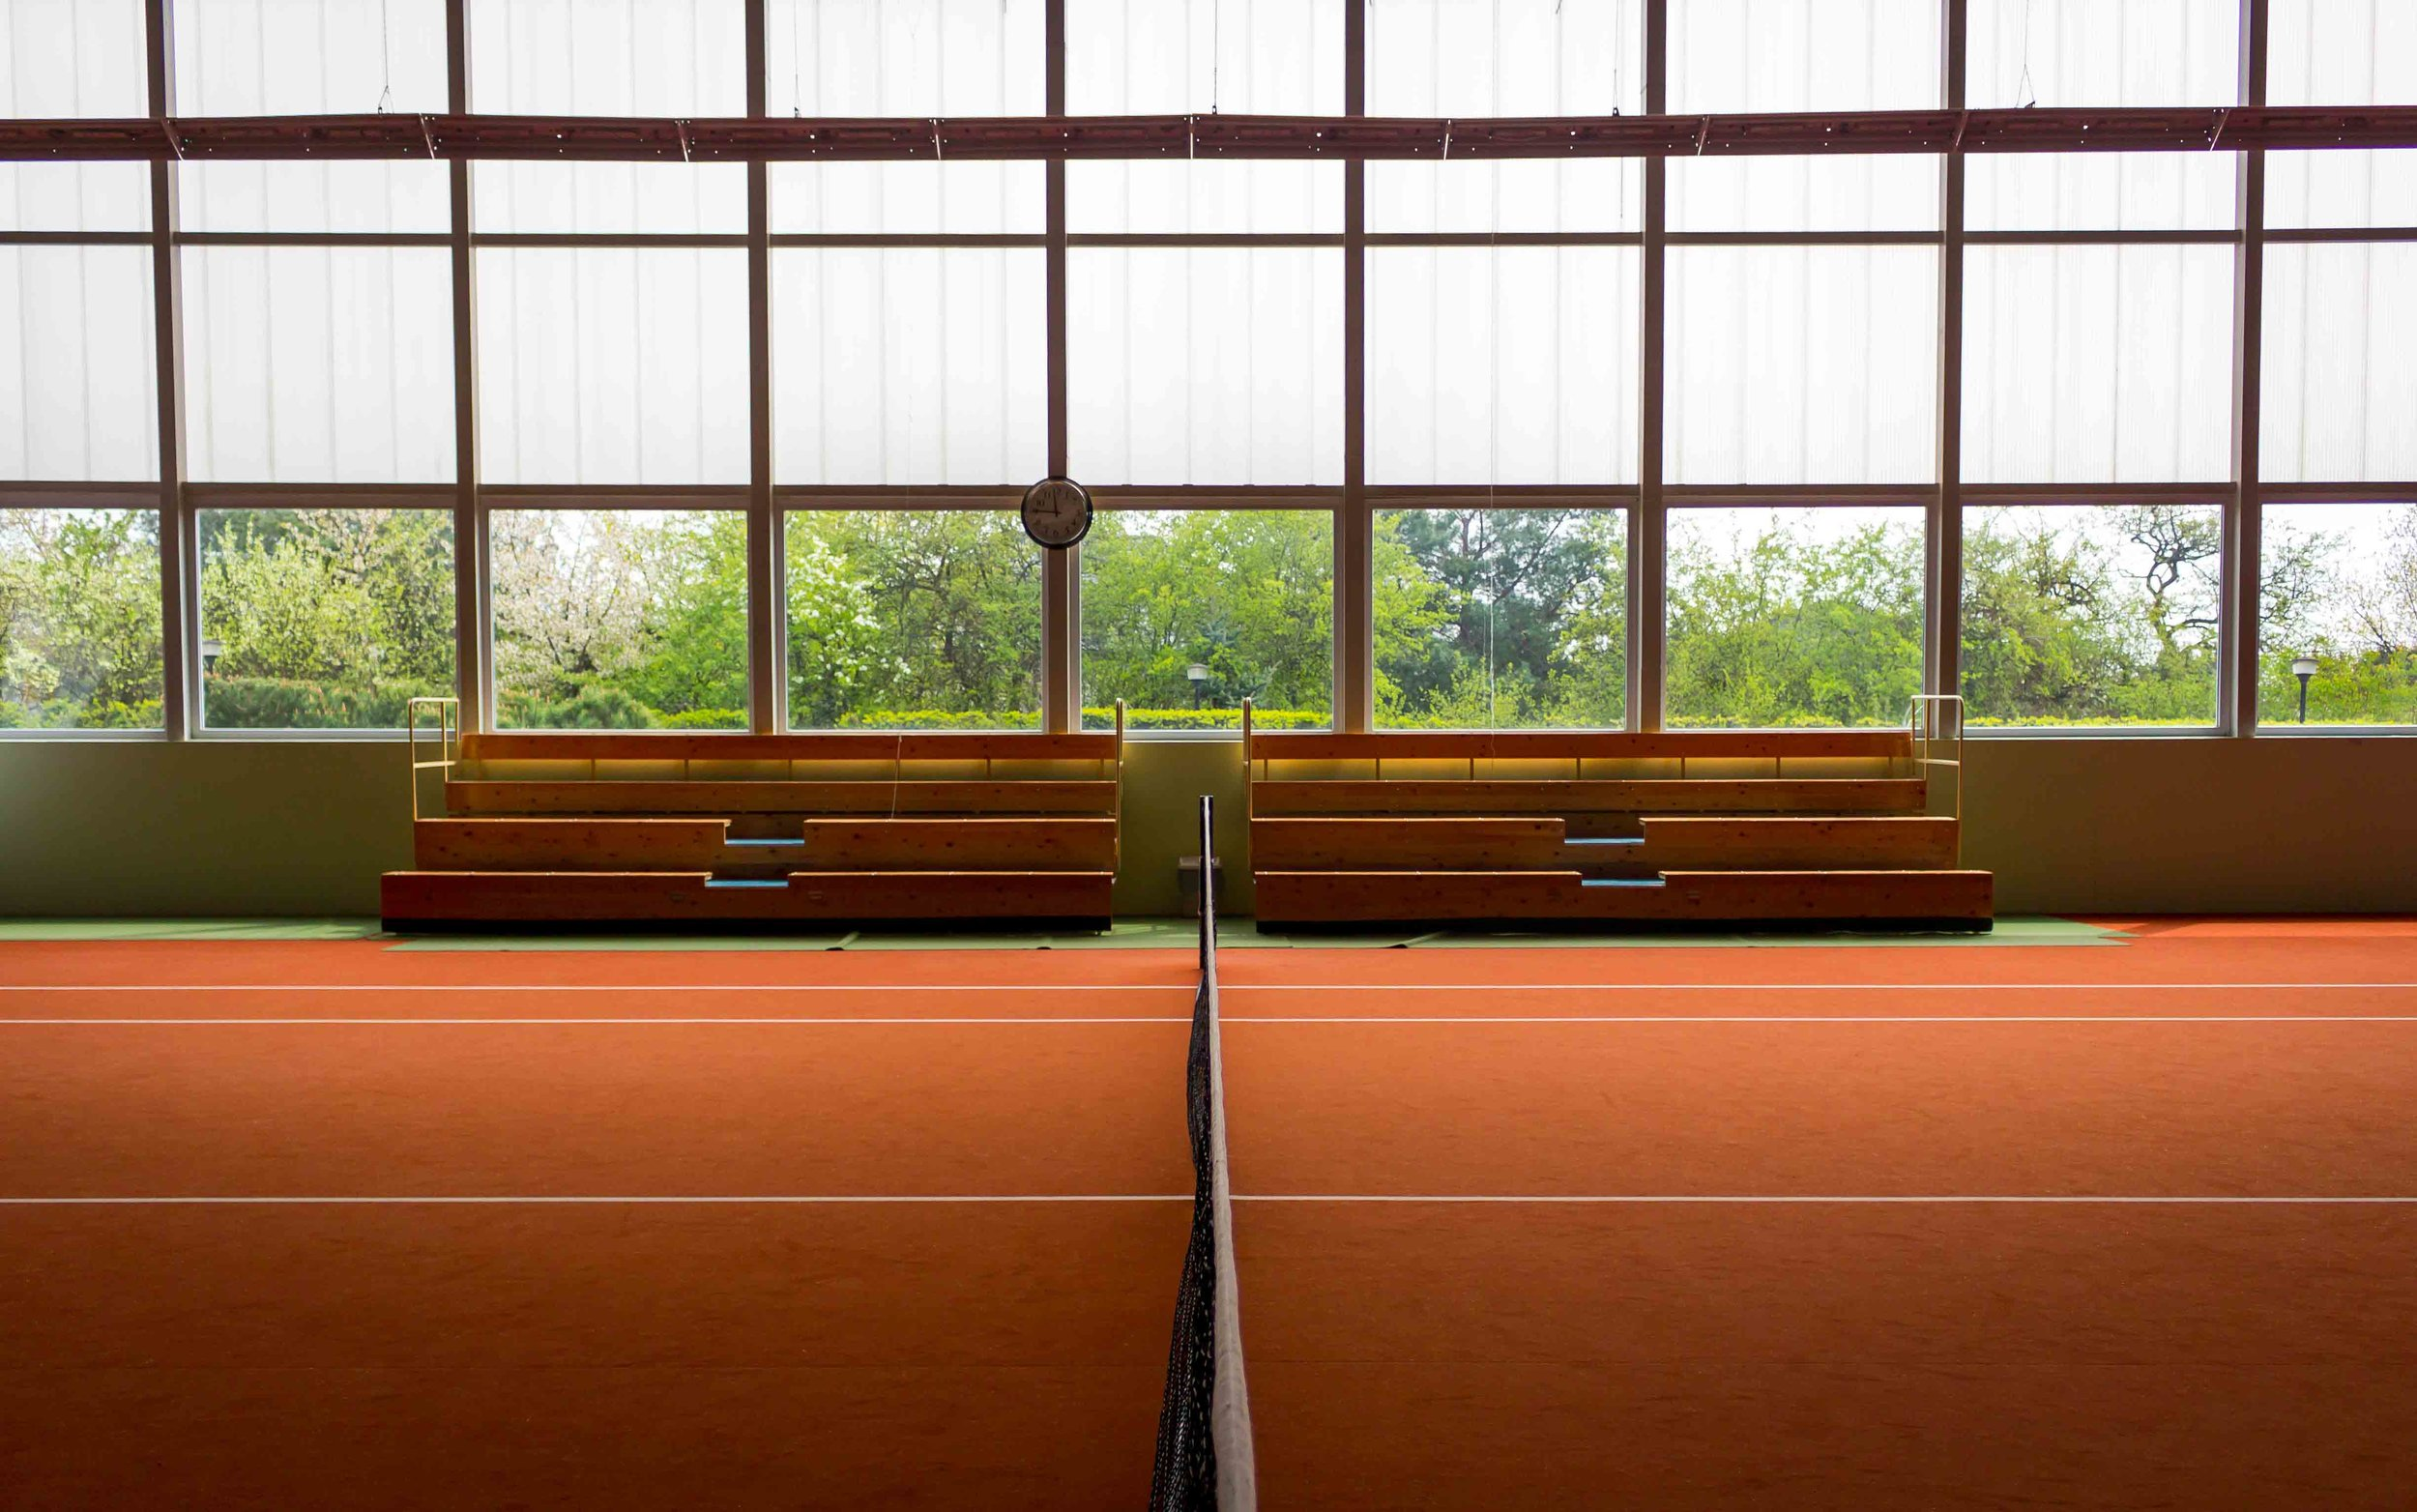 indoor-court-angie-by-karolina-sznycer